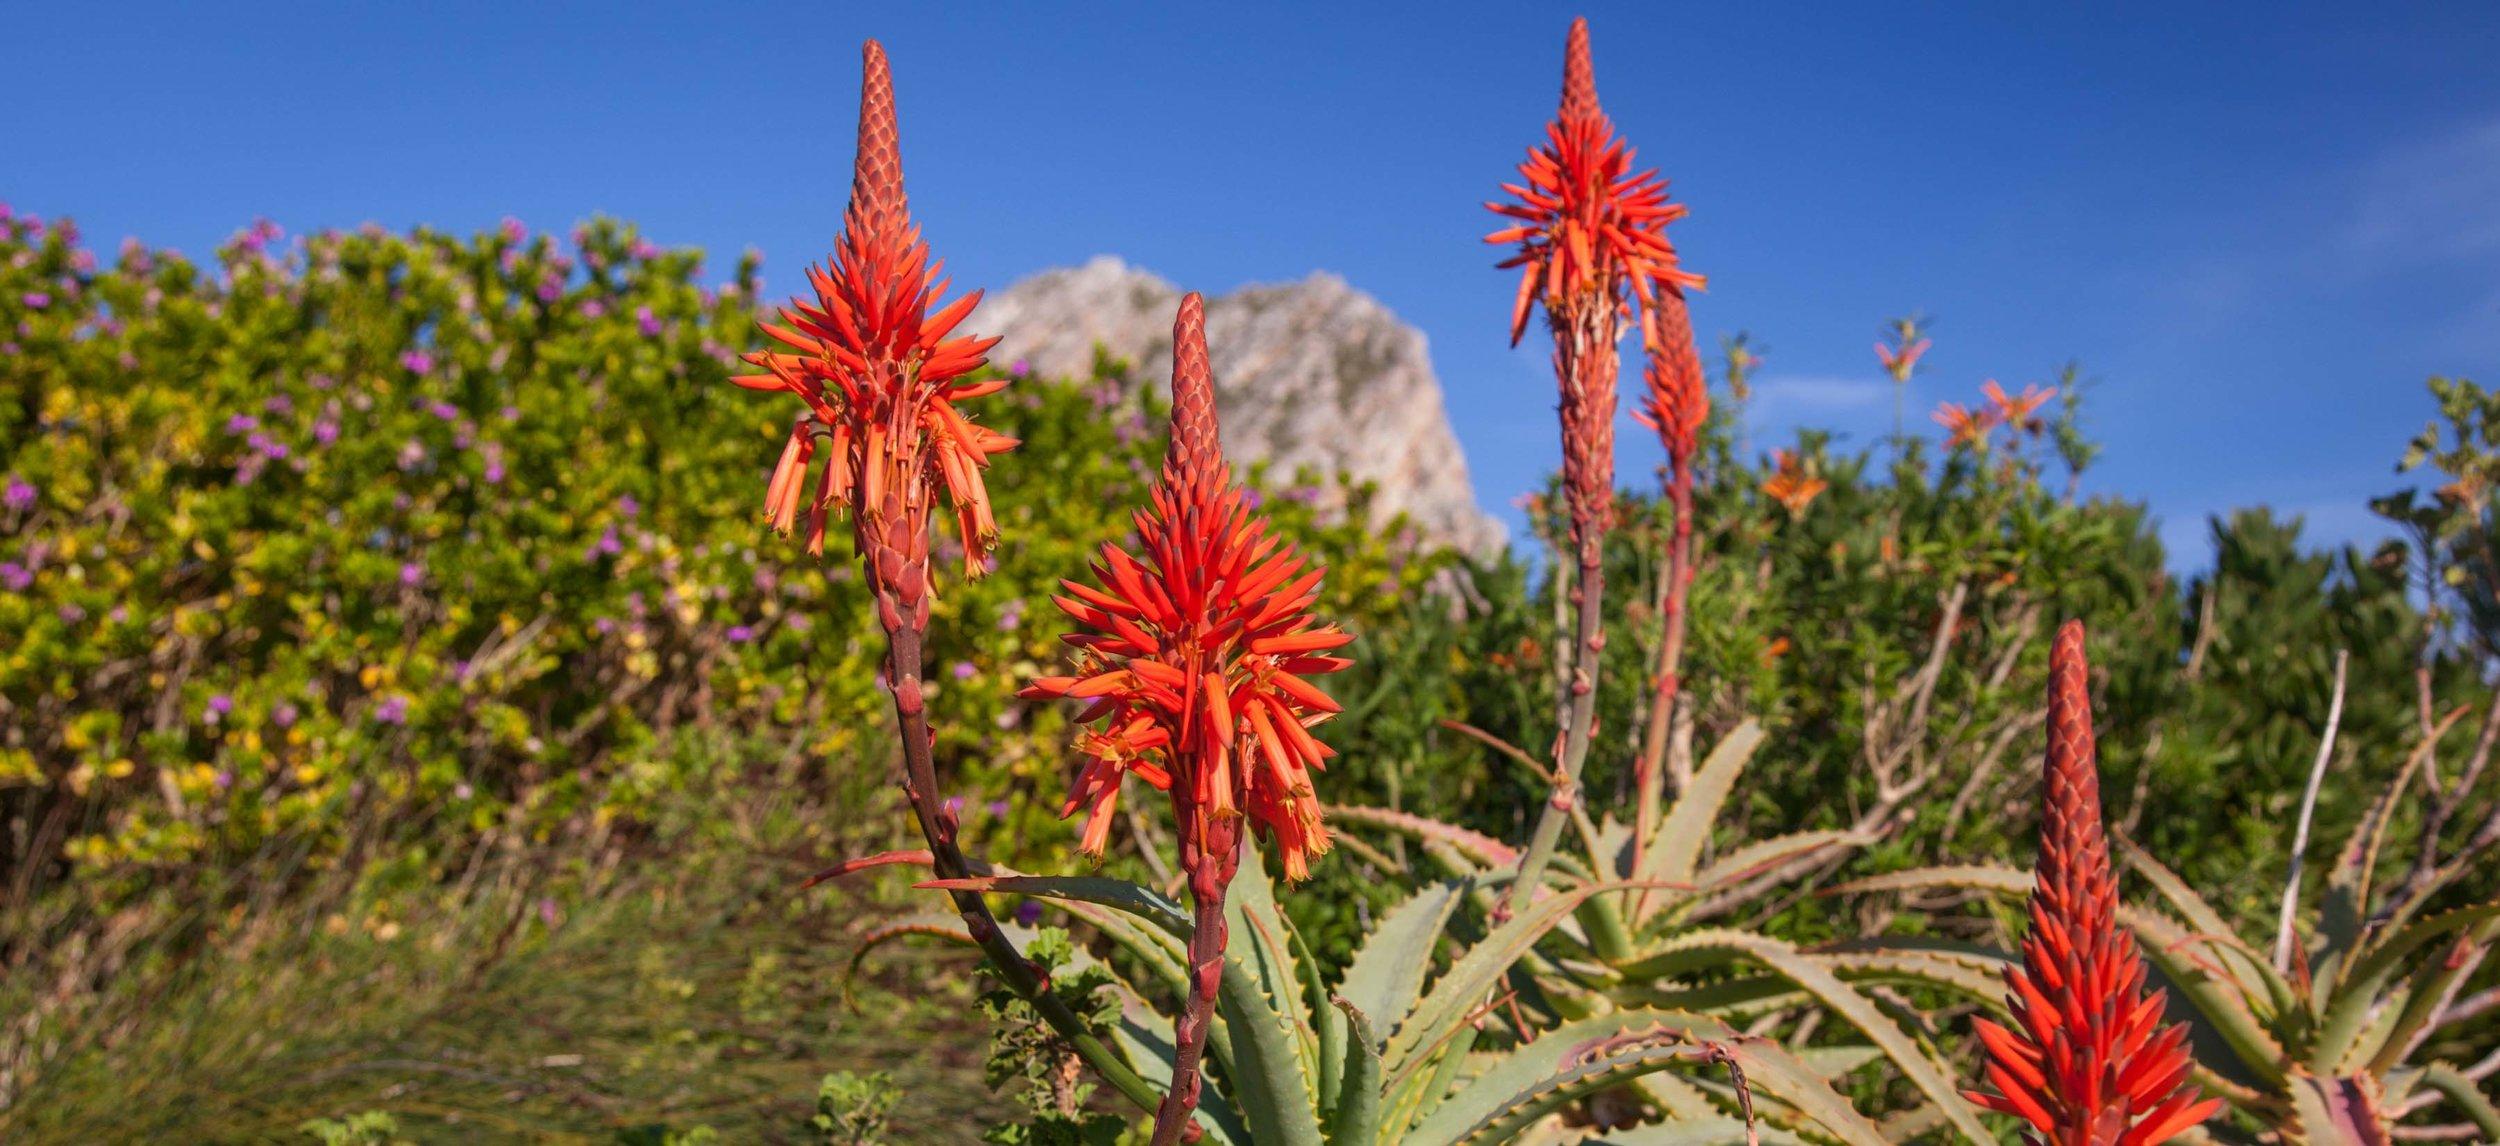 Aloe Vera growing in Pringle Bay Biosphere